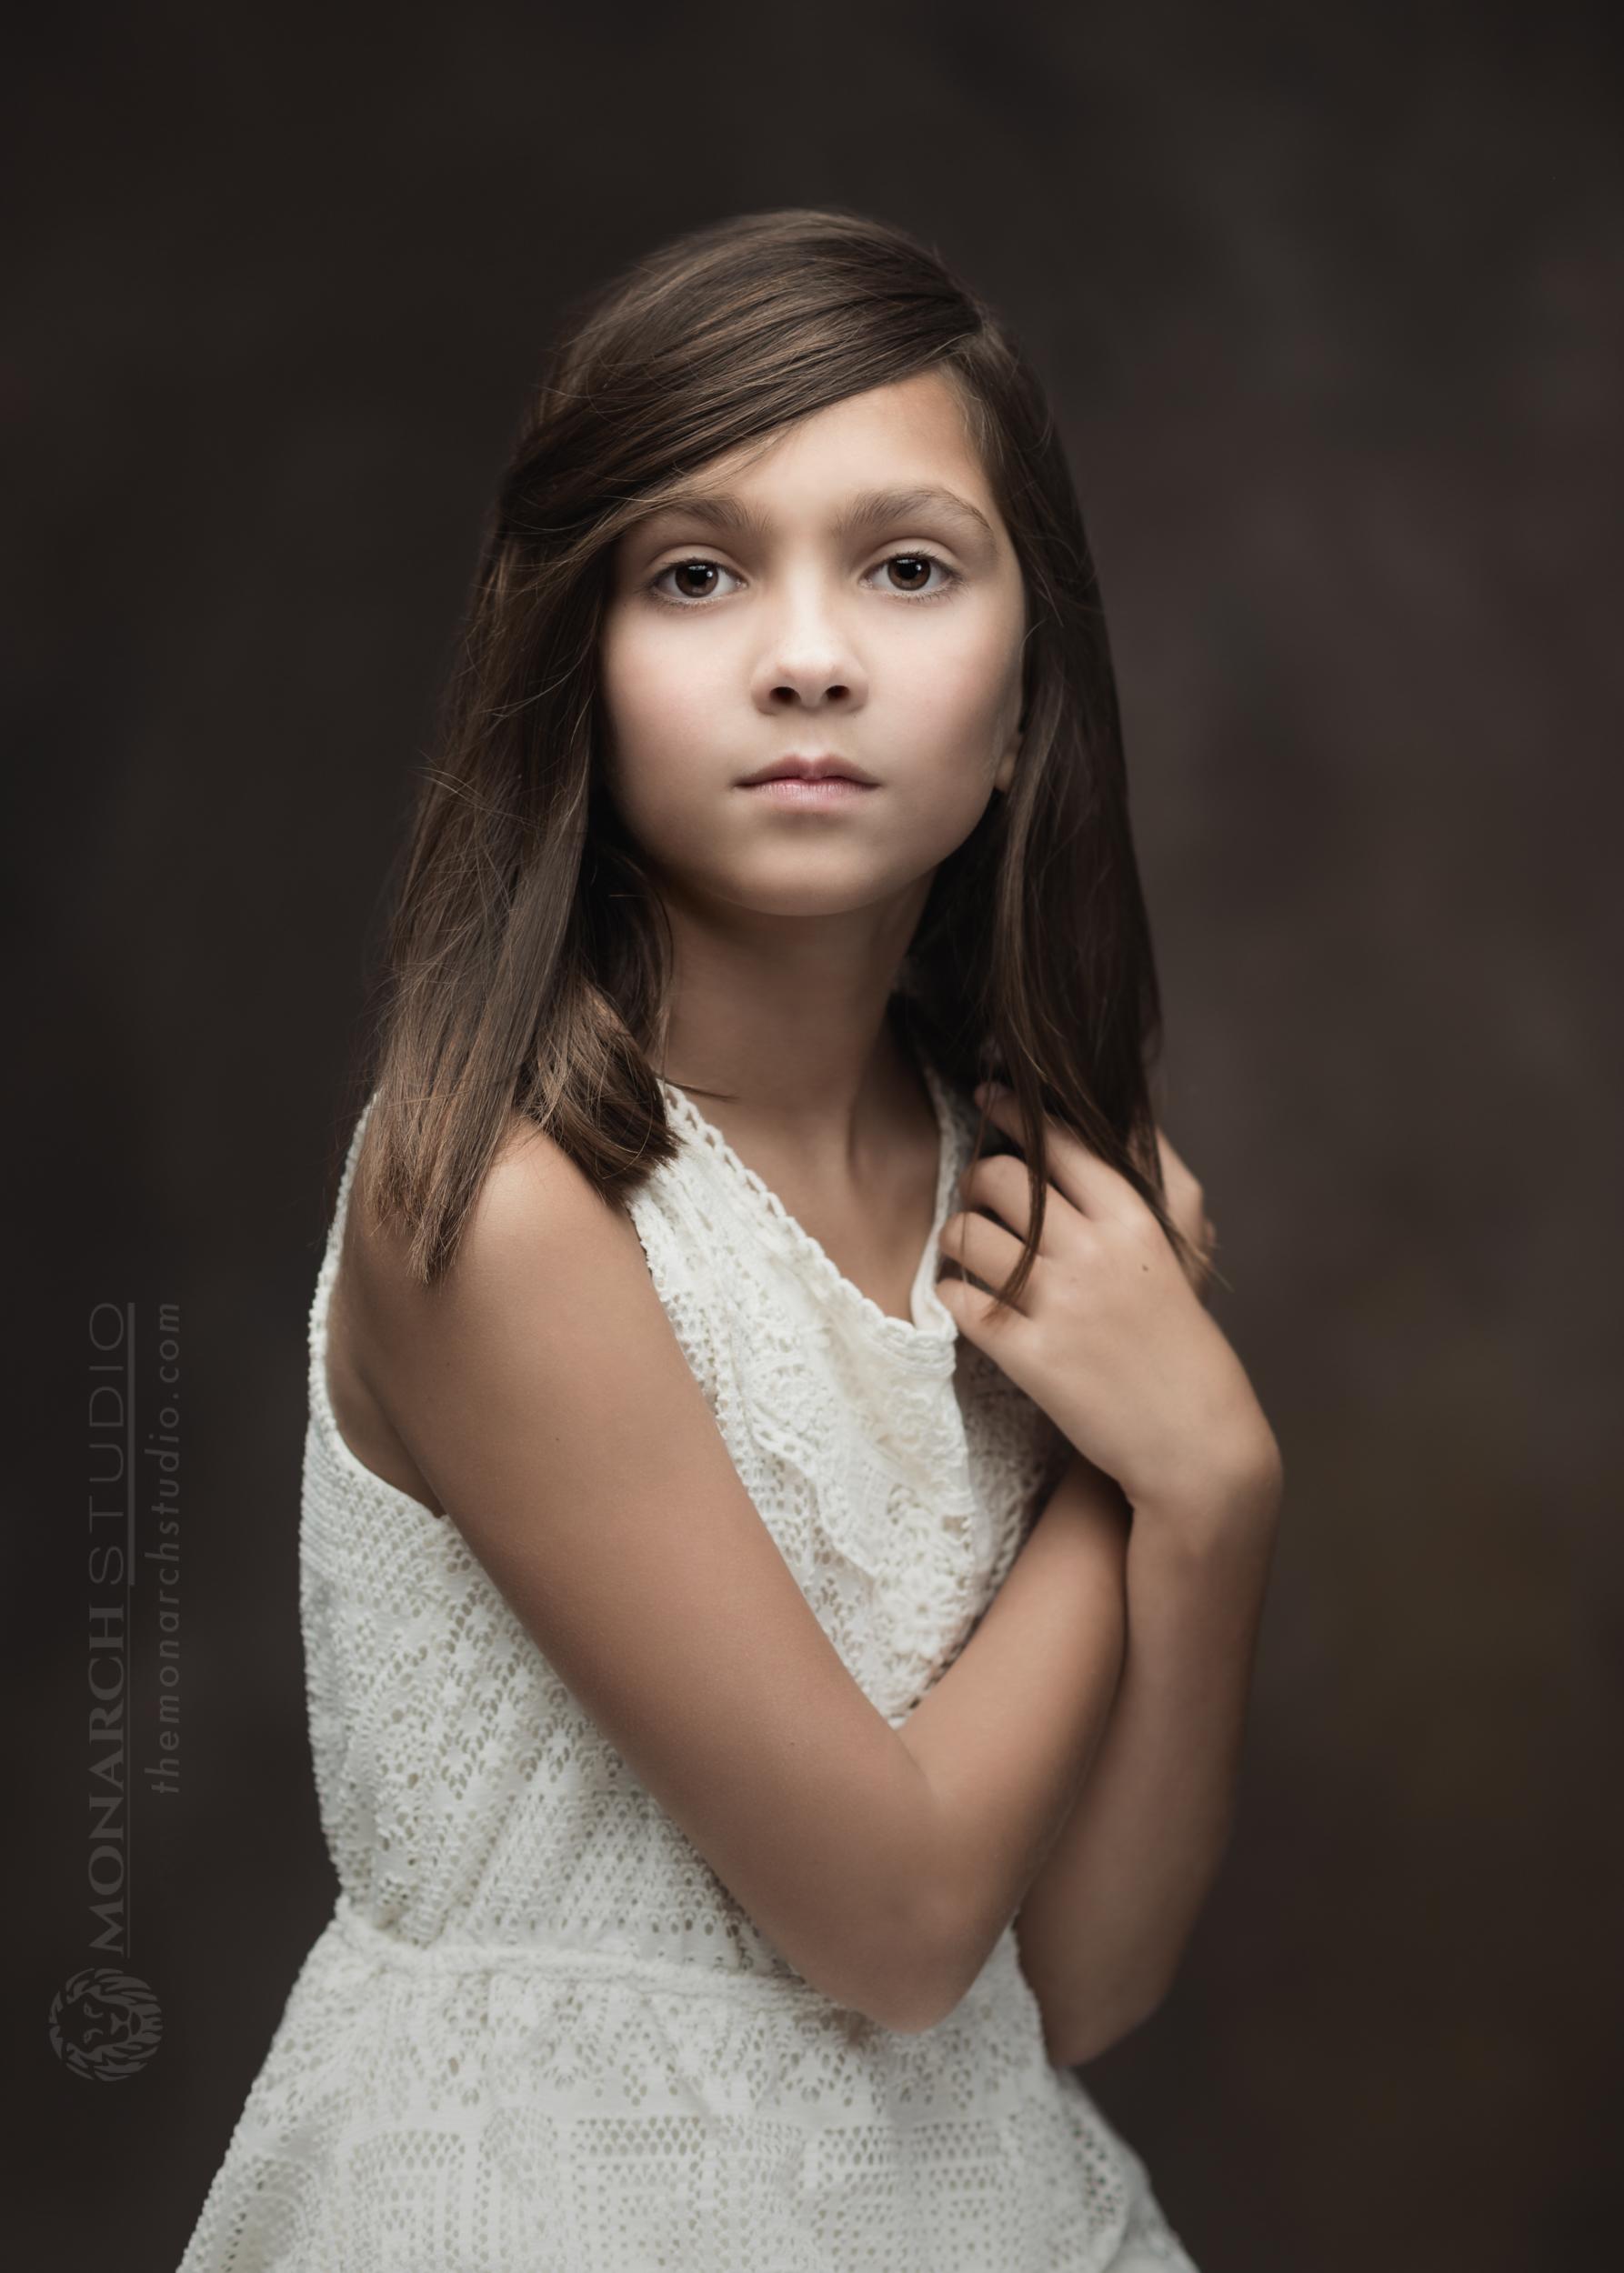 Fine art children's portraiture of girl in Florida photography studio.